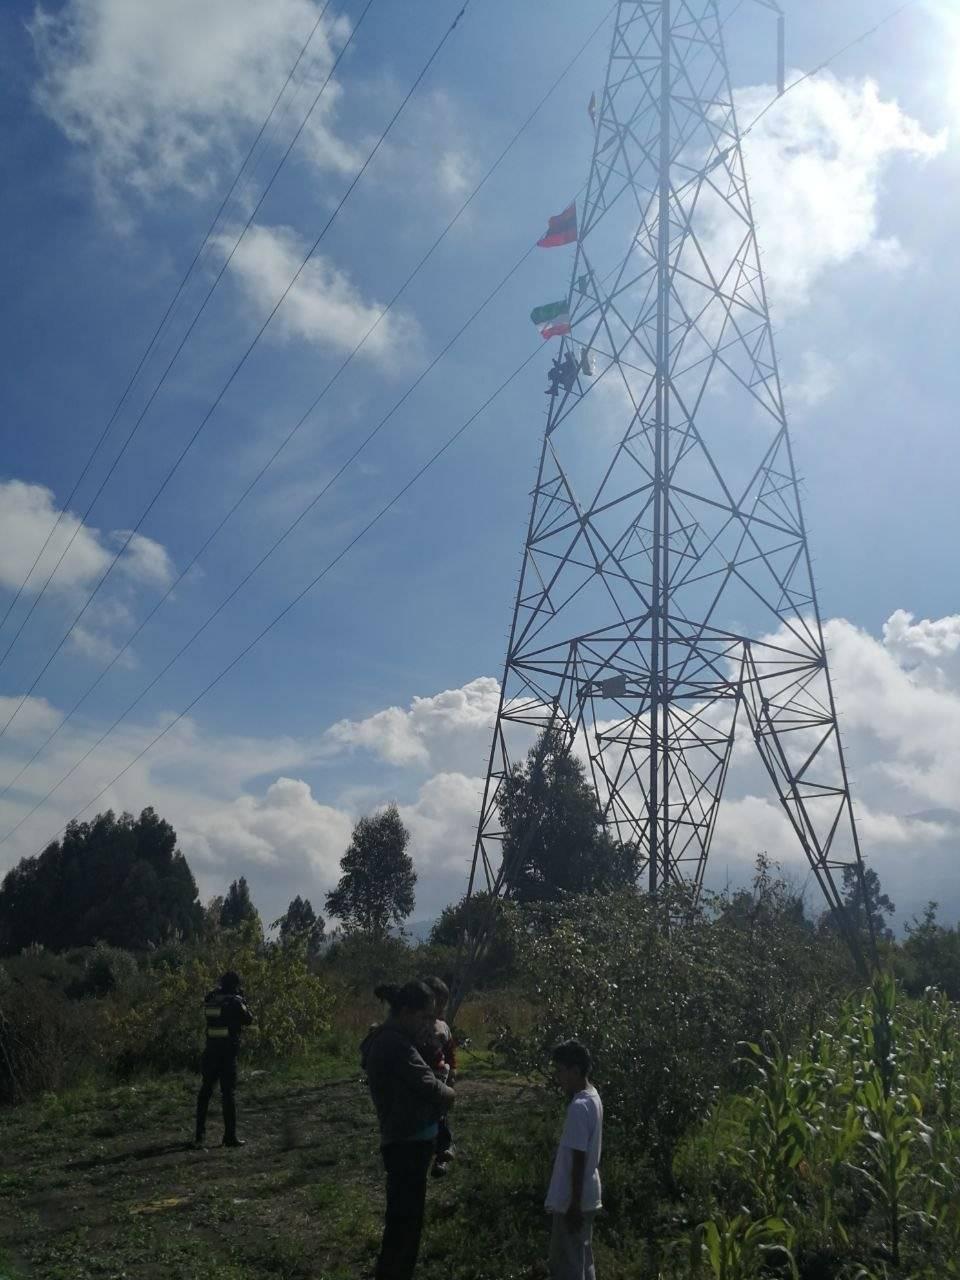 Tungurahua: Hombre sube a cumbre de torre eléctrica para intentar suicidarse